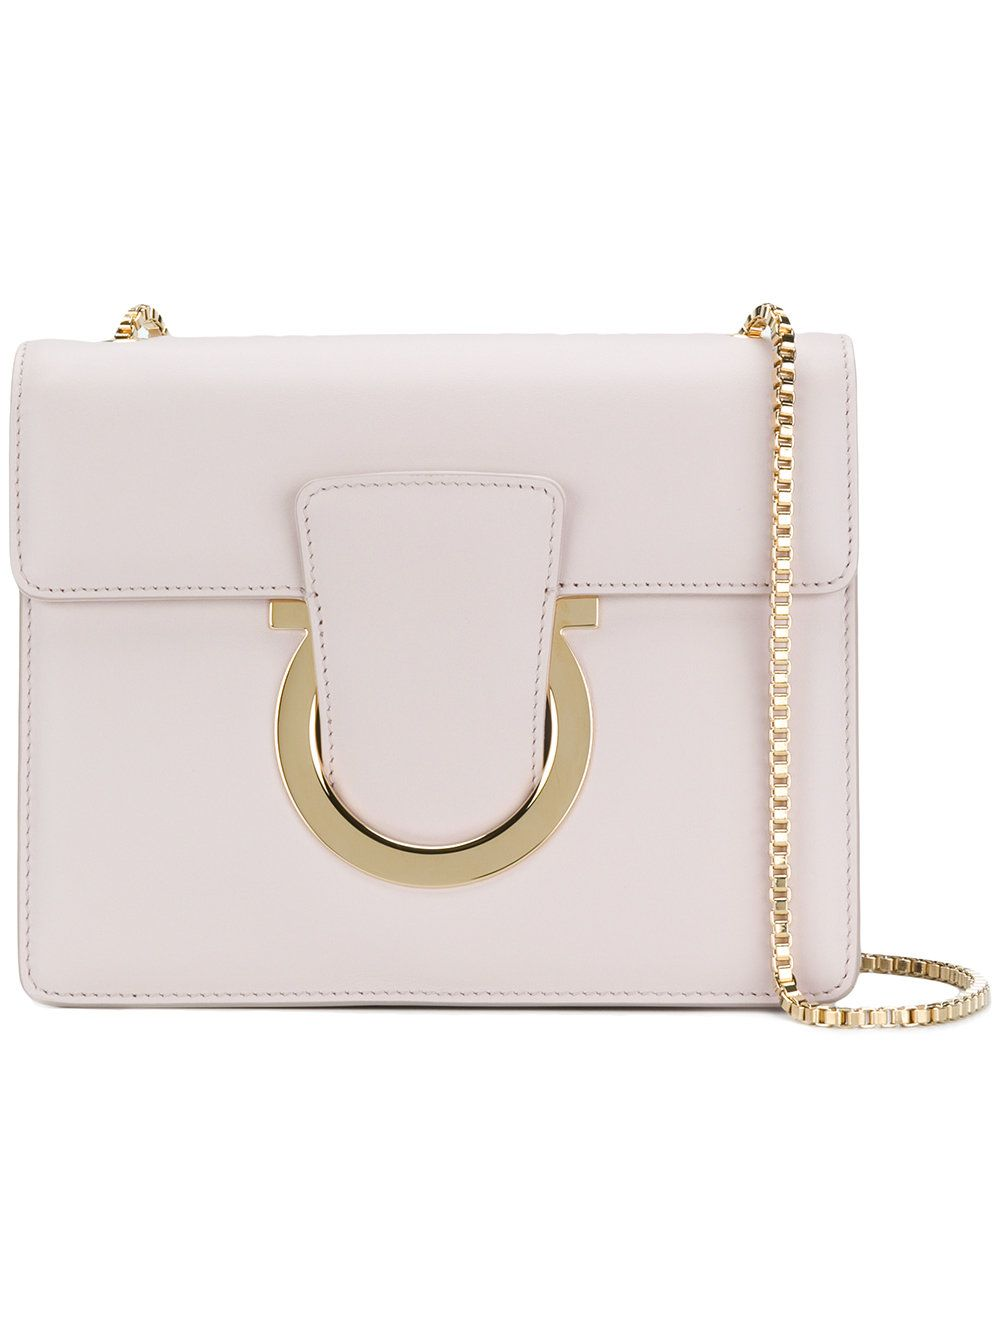 colour block shoulder bag - Nude & Neutrals Salvatore Ferragamo b3iupm5hKi